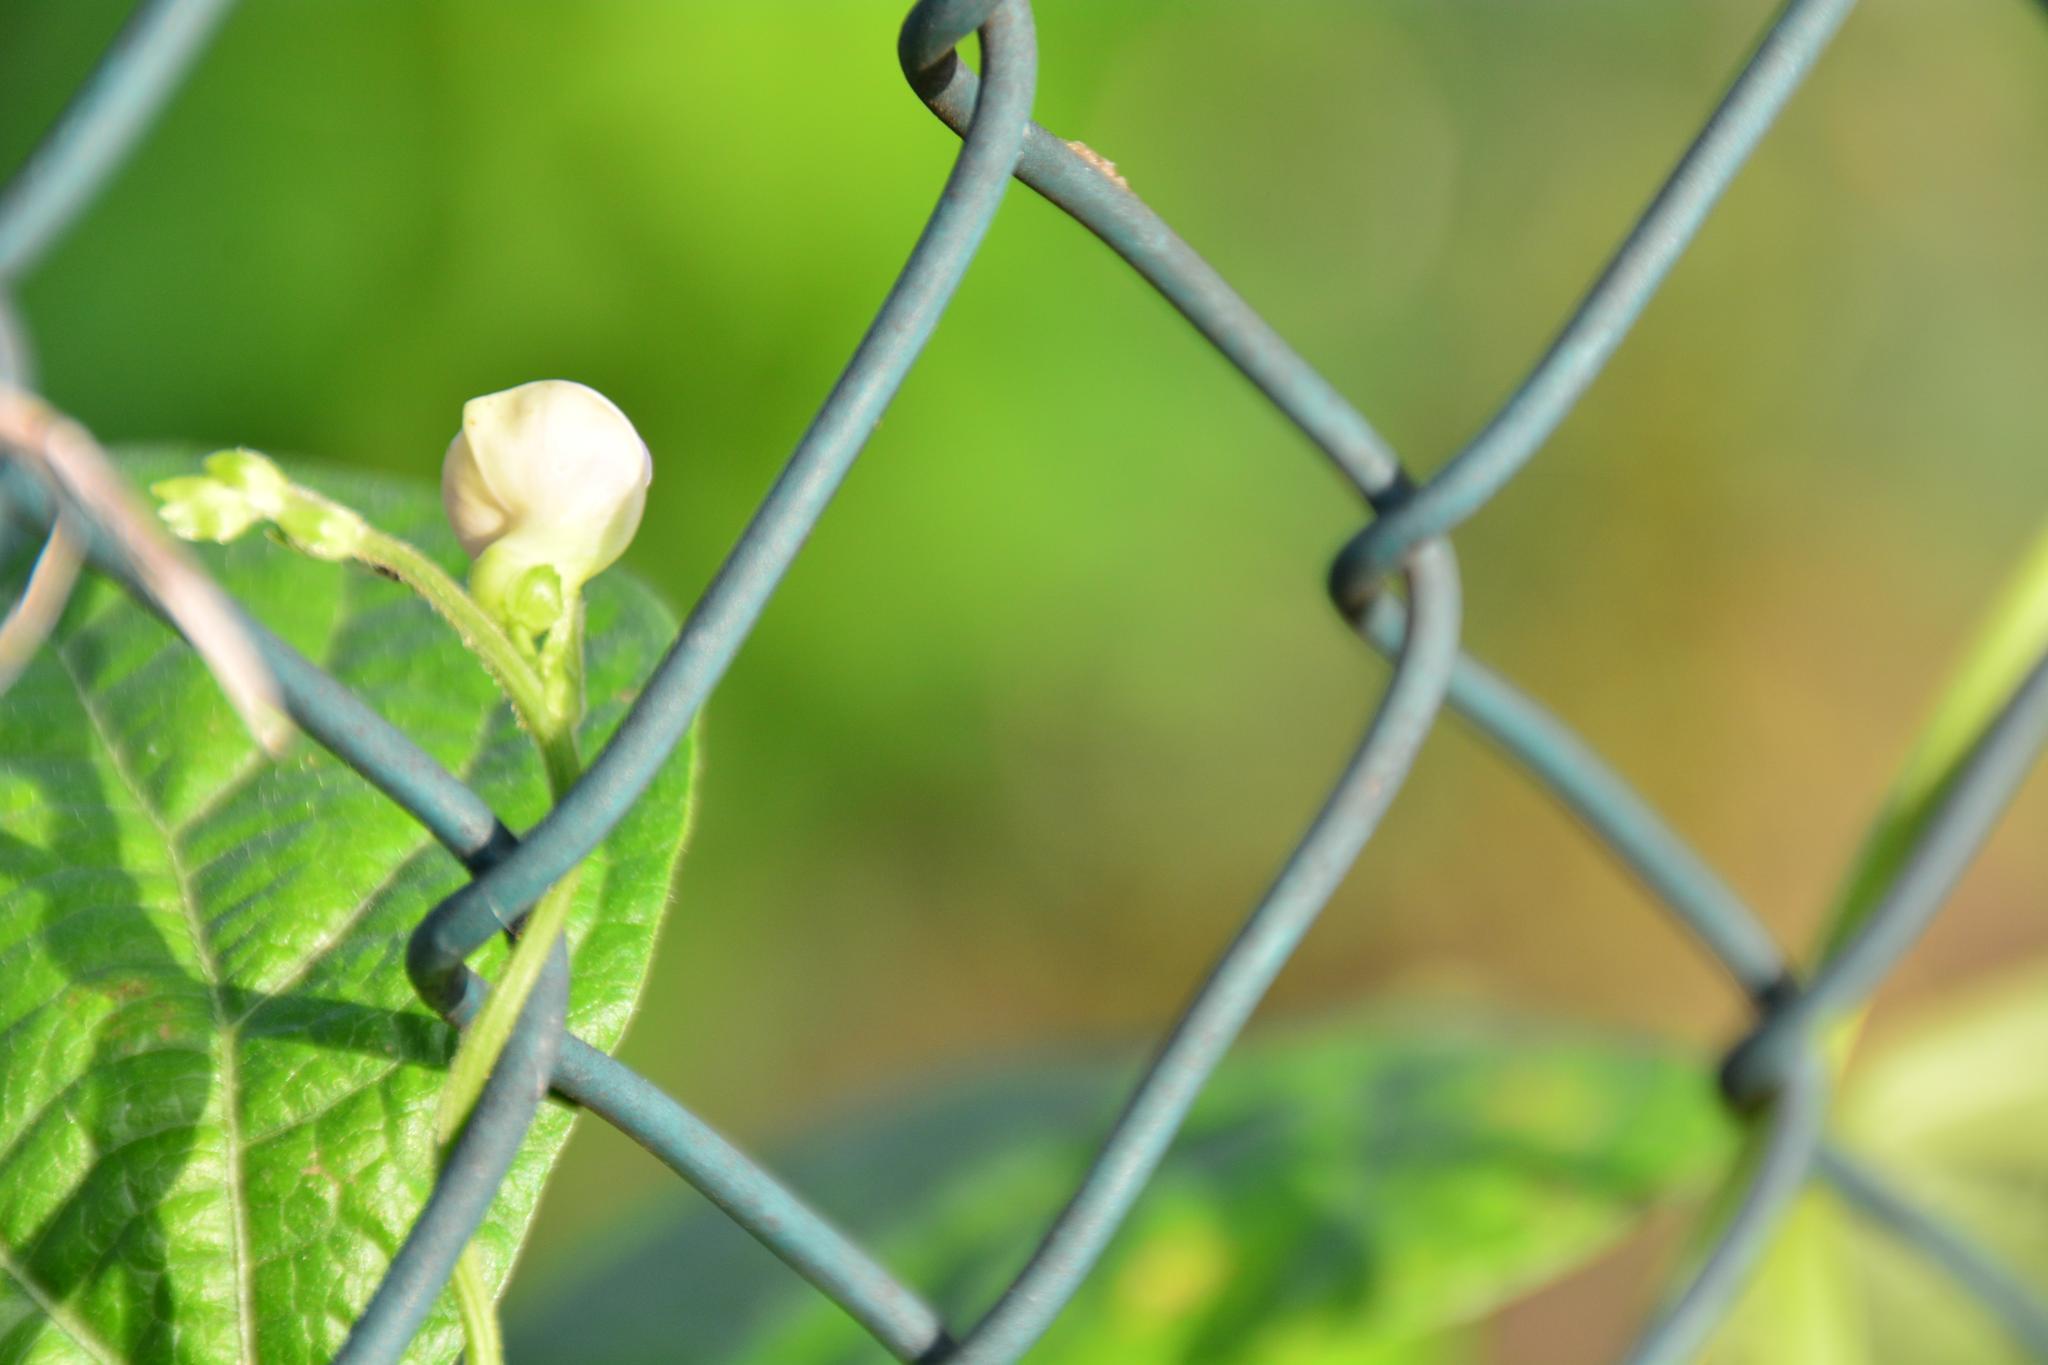 Bean flower by Silviu Calistru